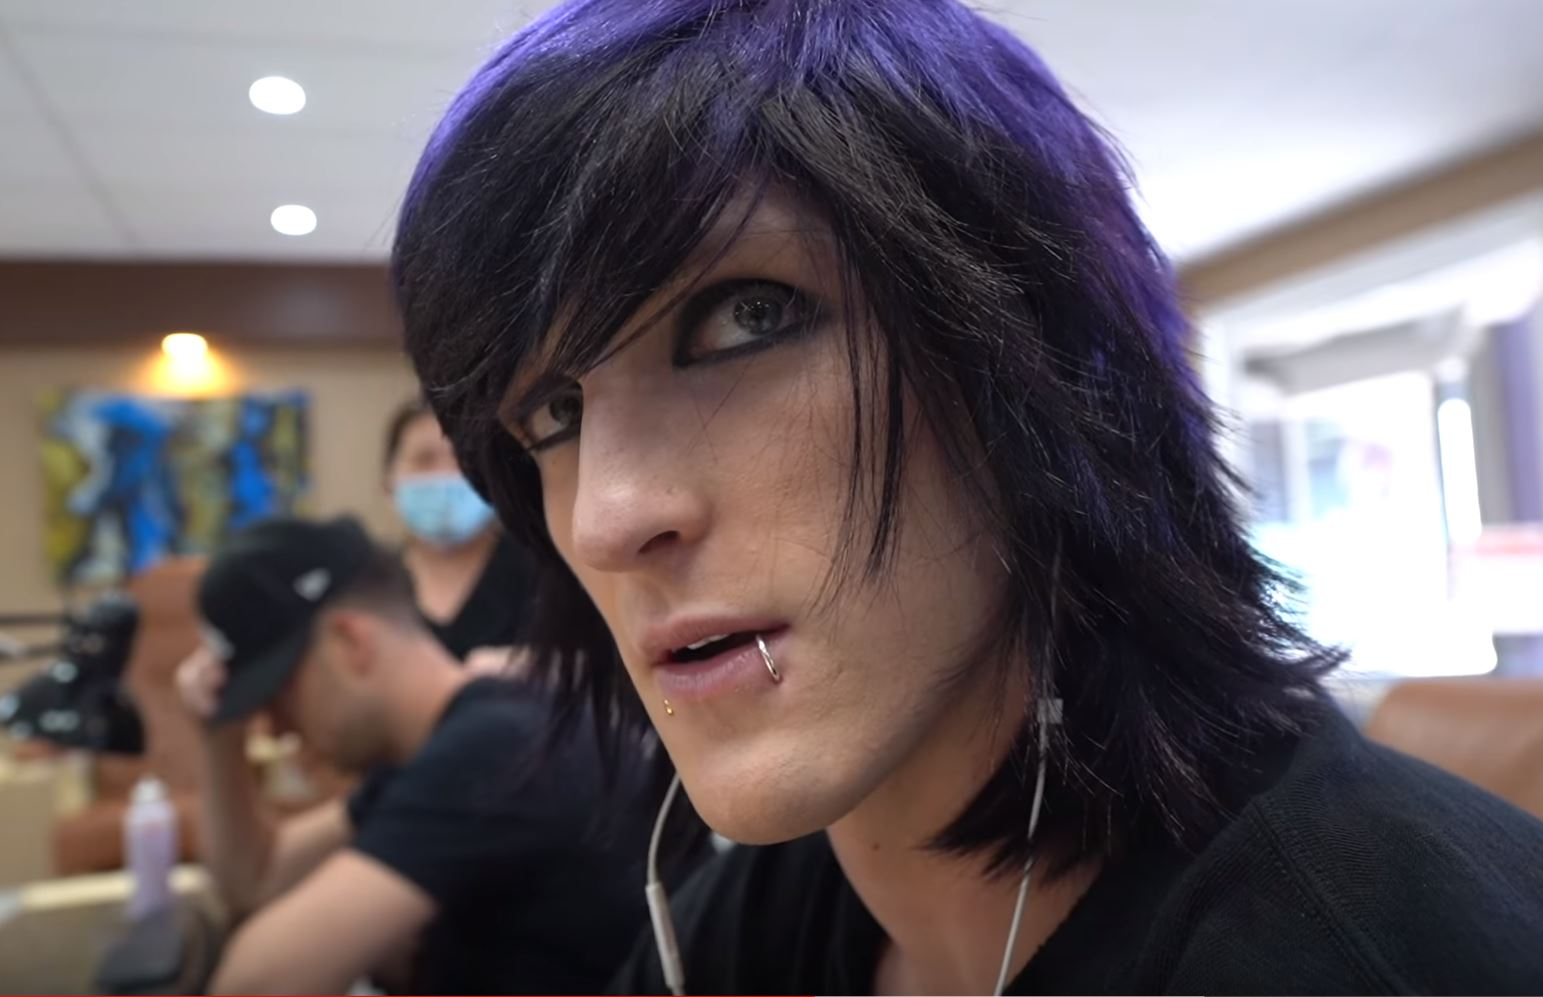 Jake Paul Purple Hair